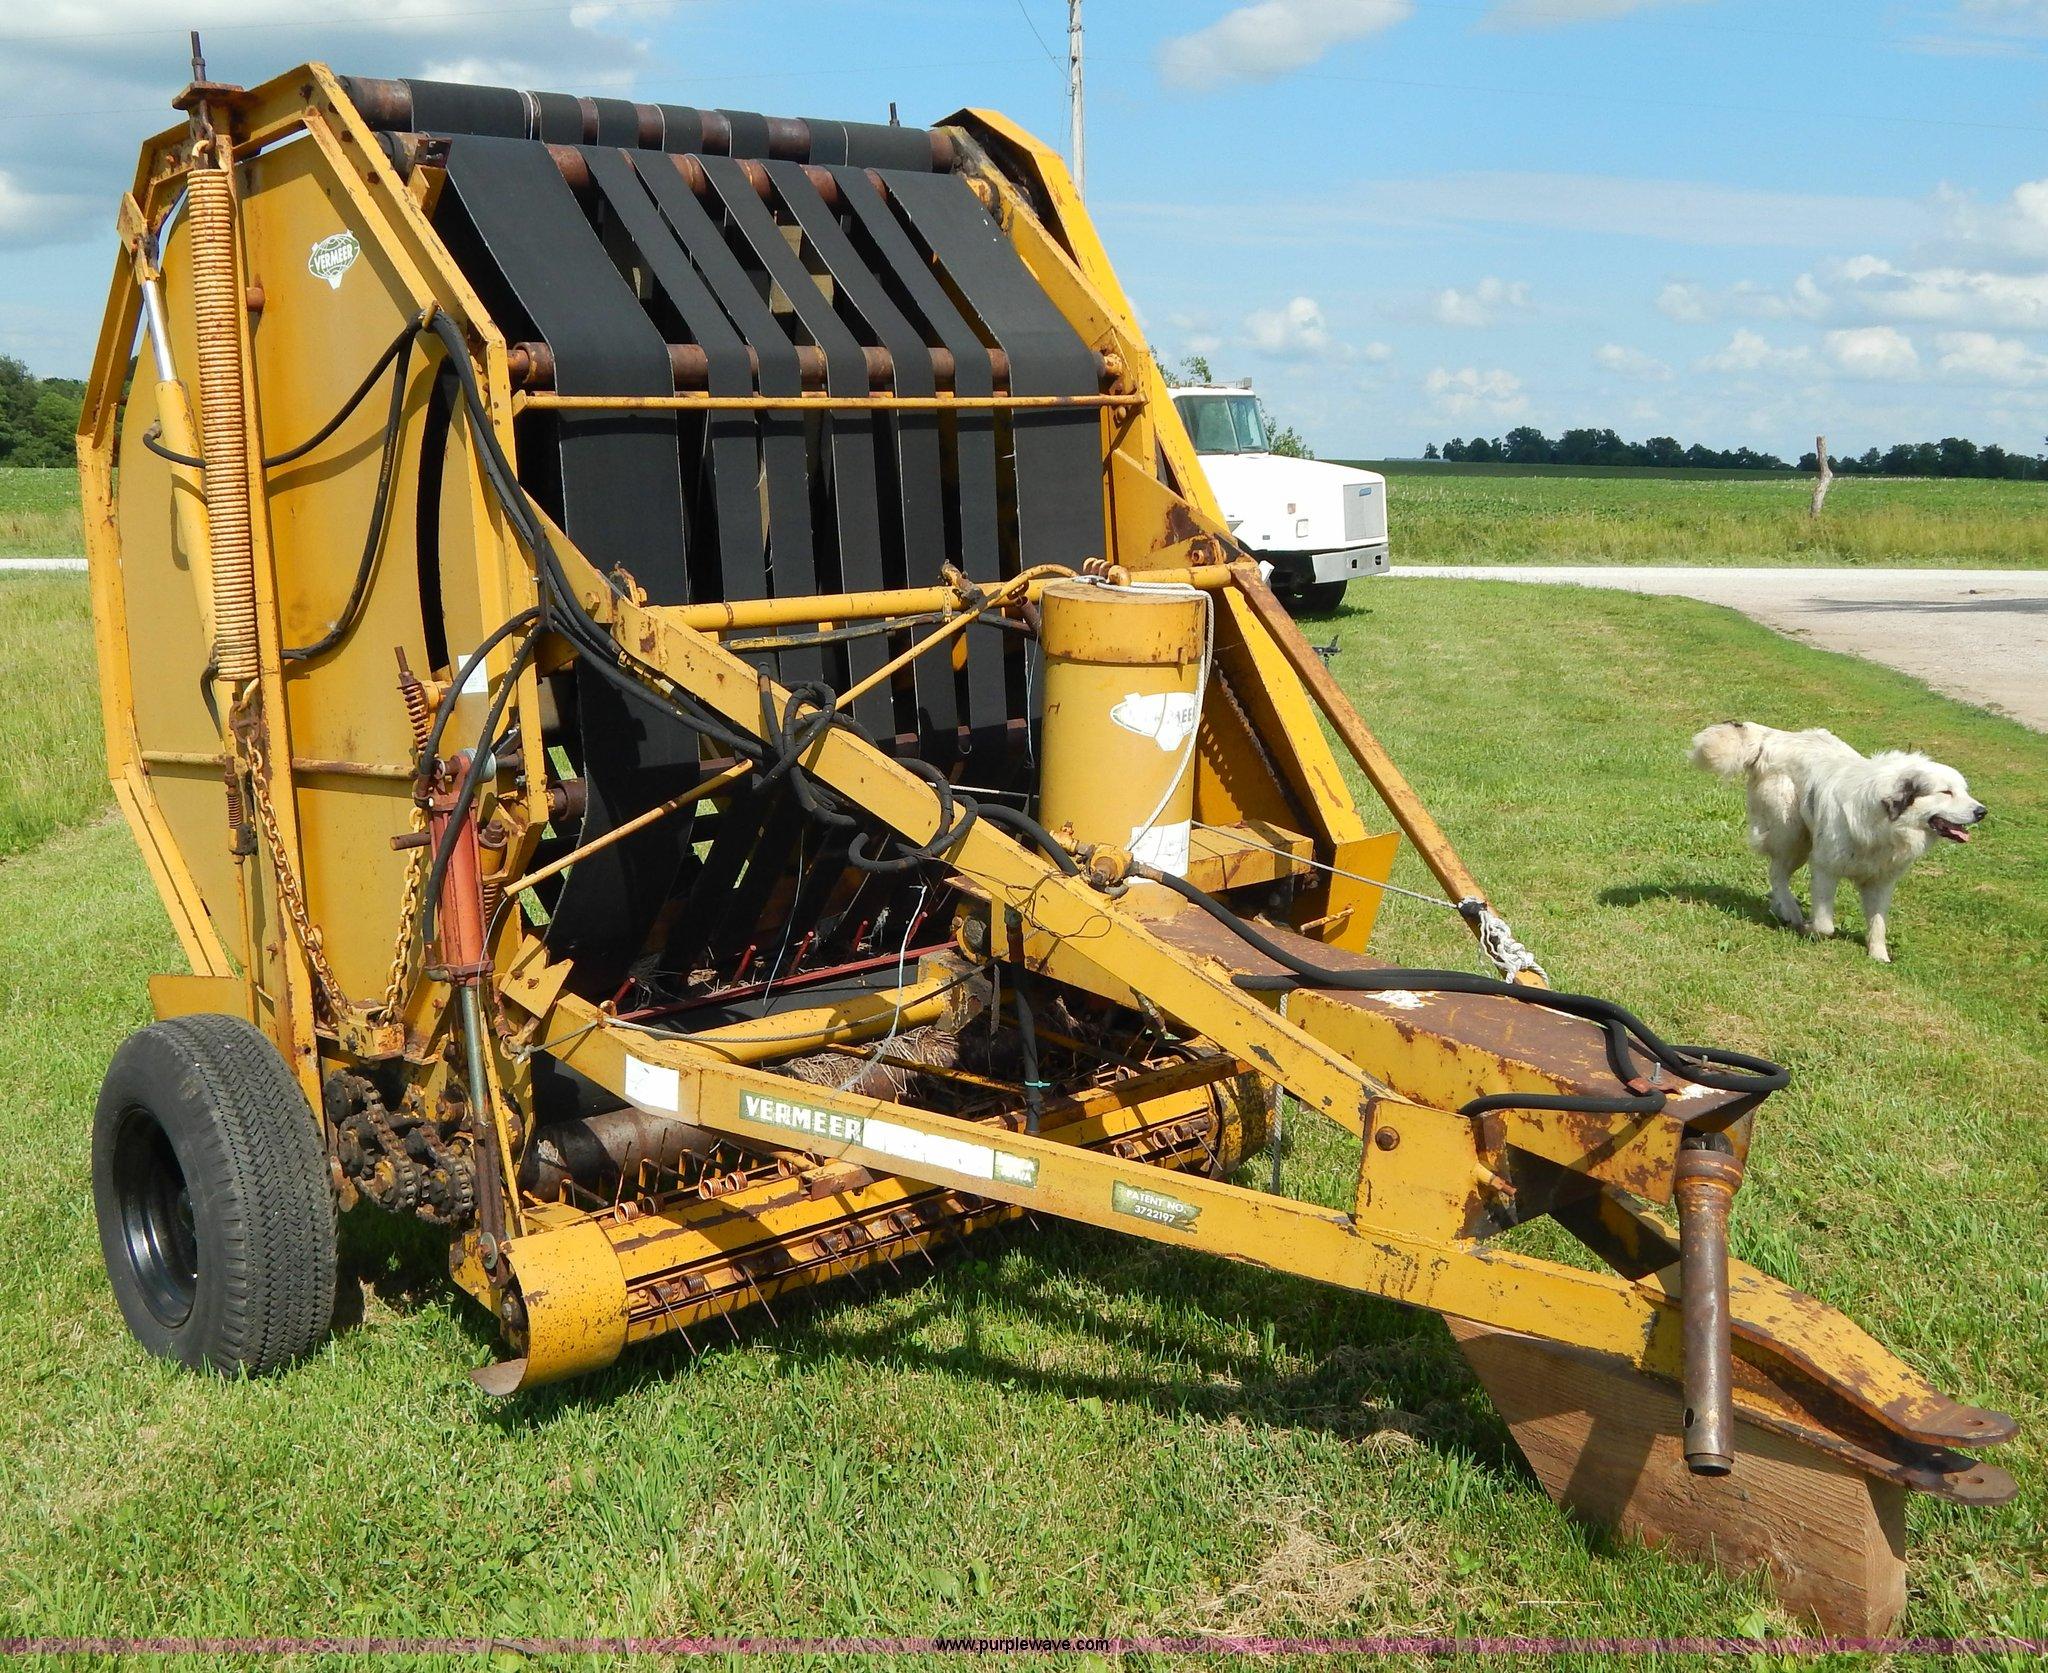 605c vermeer round baler good or bad - Z9302 Image For Item Z9302 1974 Vermeer 605c Round Baler